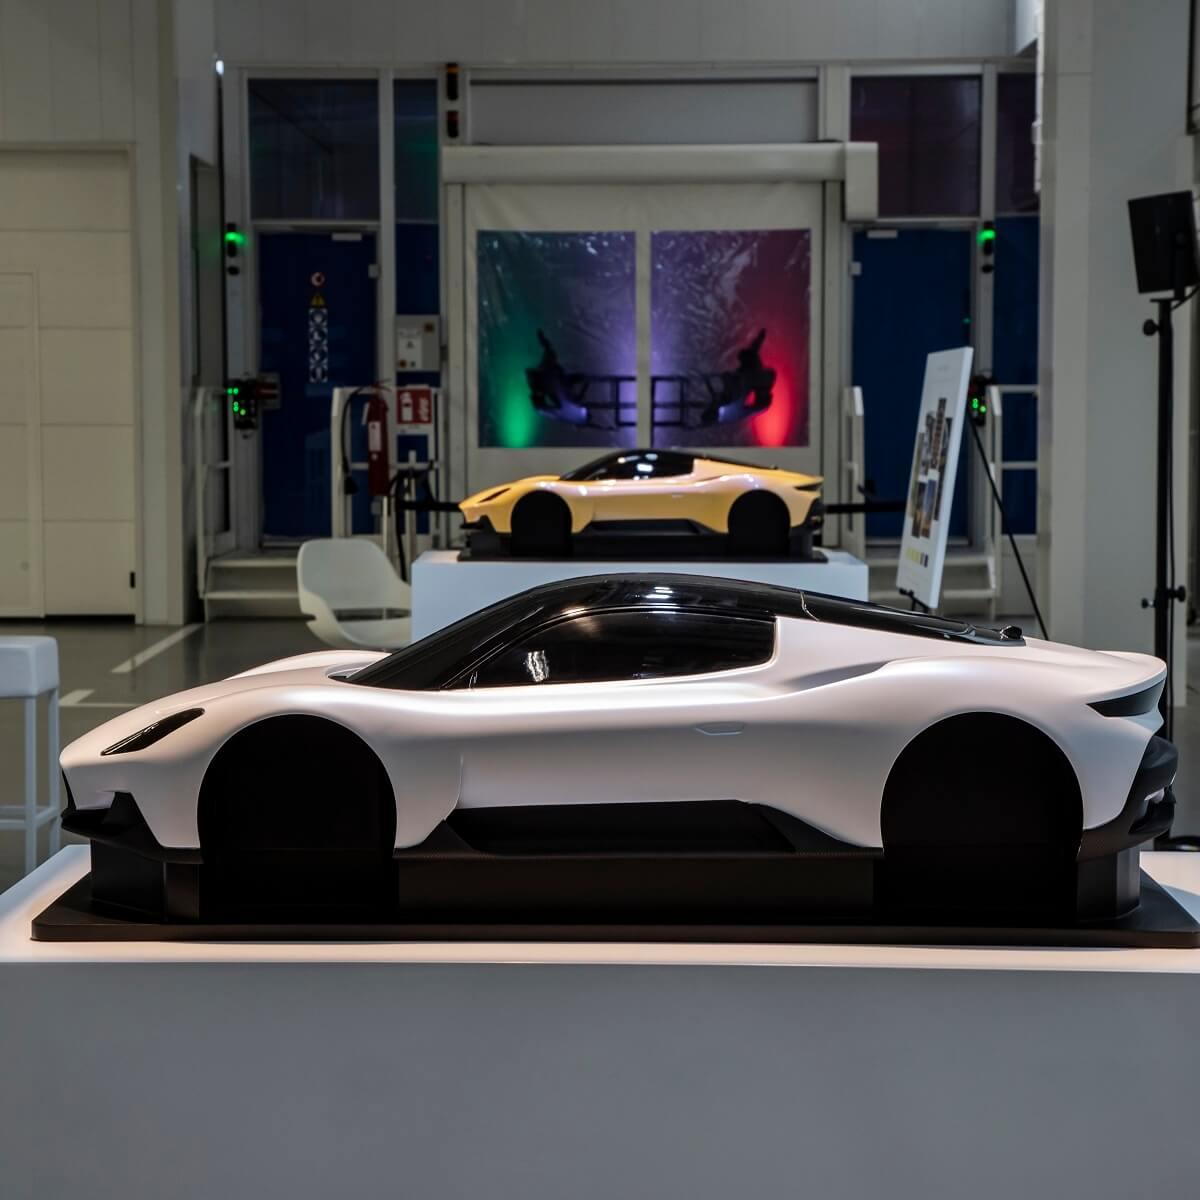 02_MaseratiPaintingShop.jpg